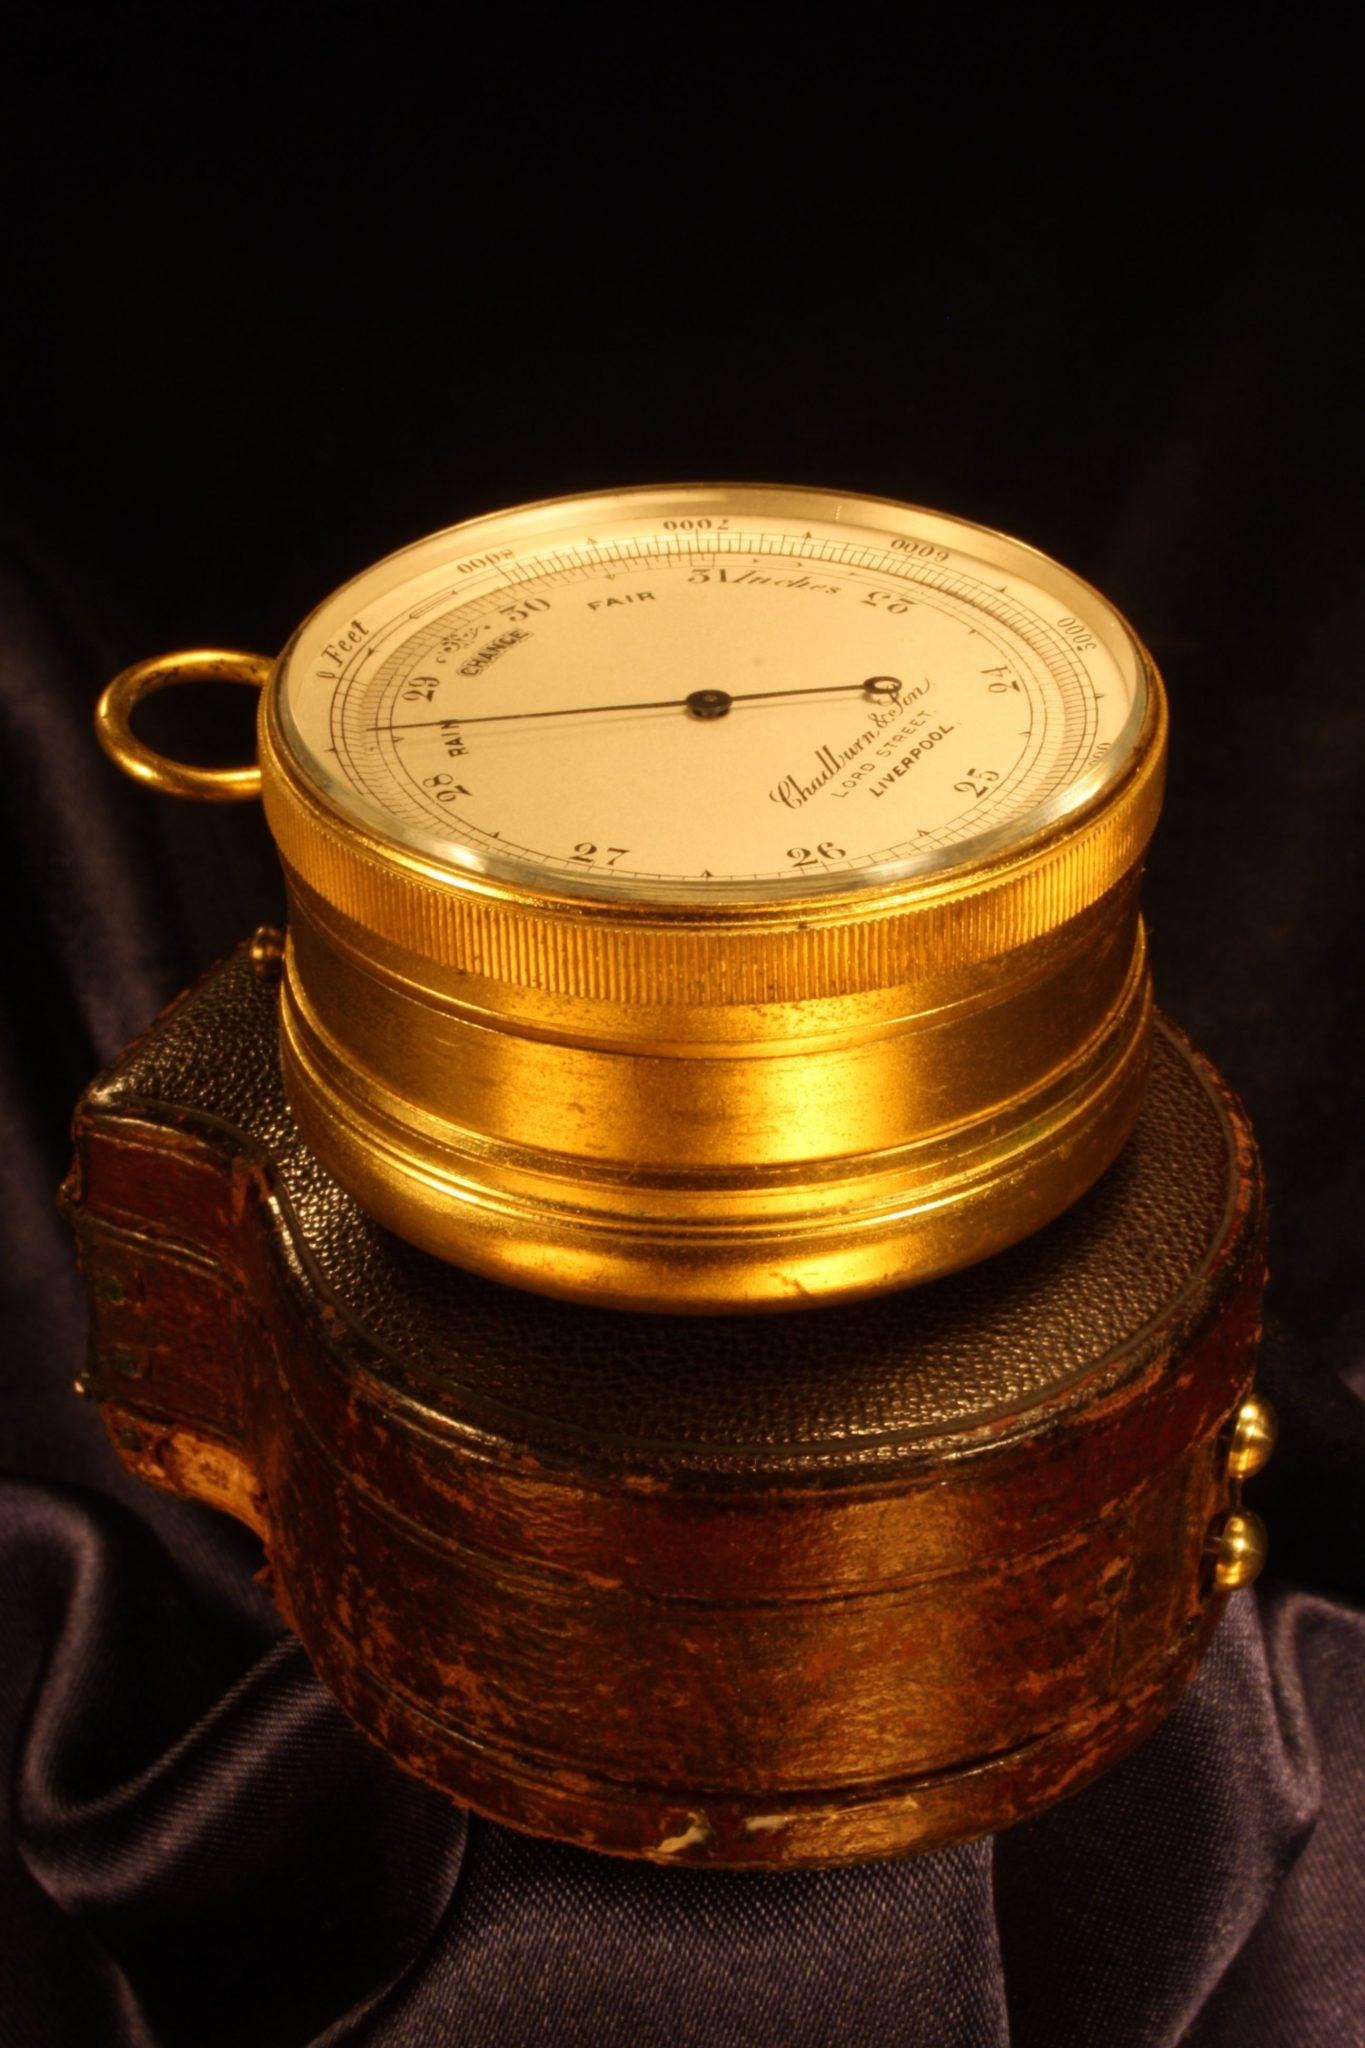 Image of Pocket Barometer Compendium by Chadburn & Son c1870